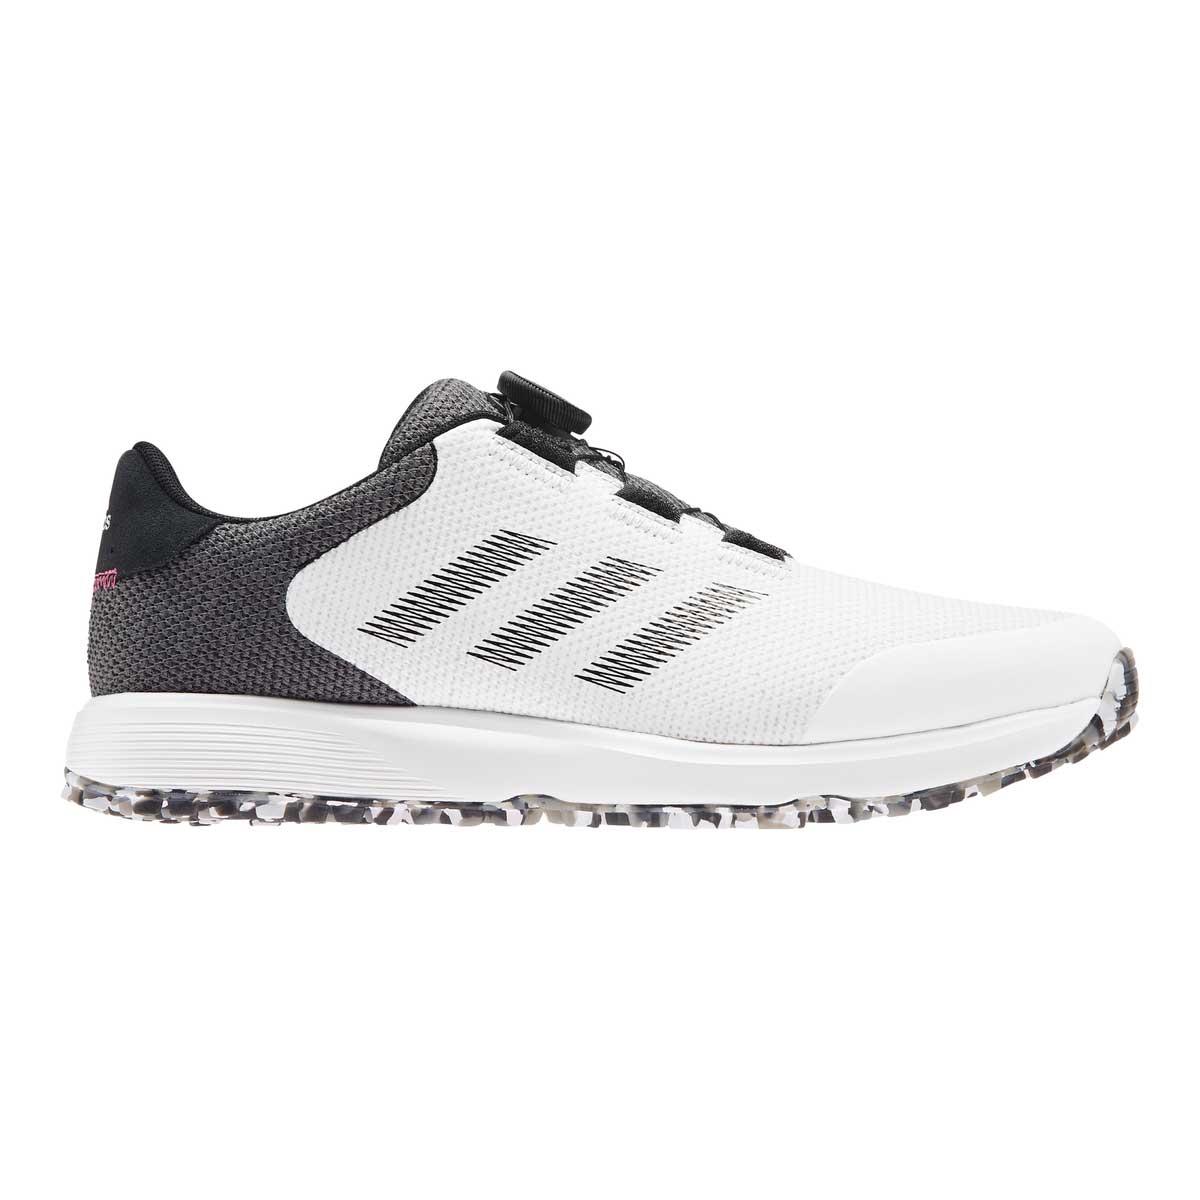 Adidas Men's S2G BOA White/Black Golf Shoe